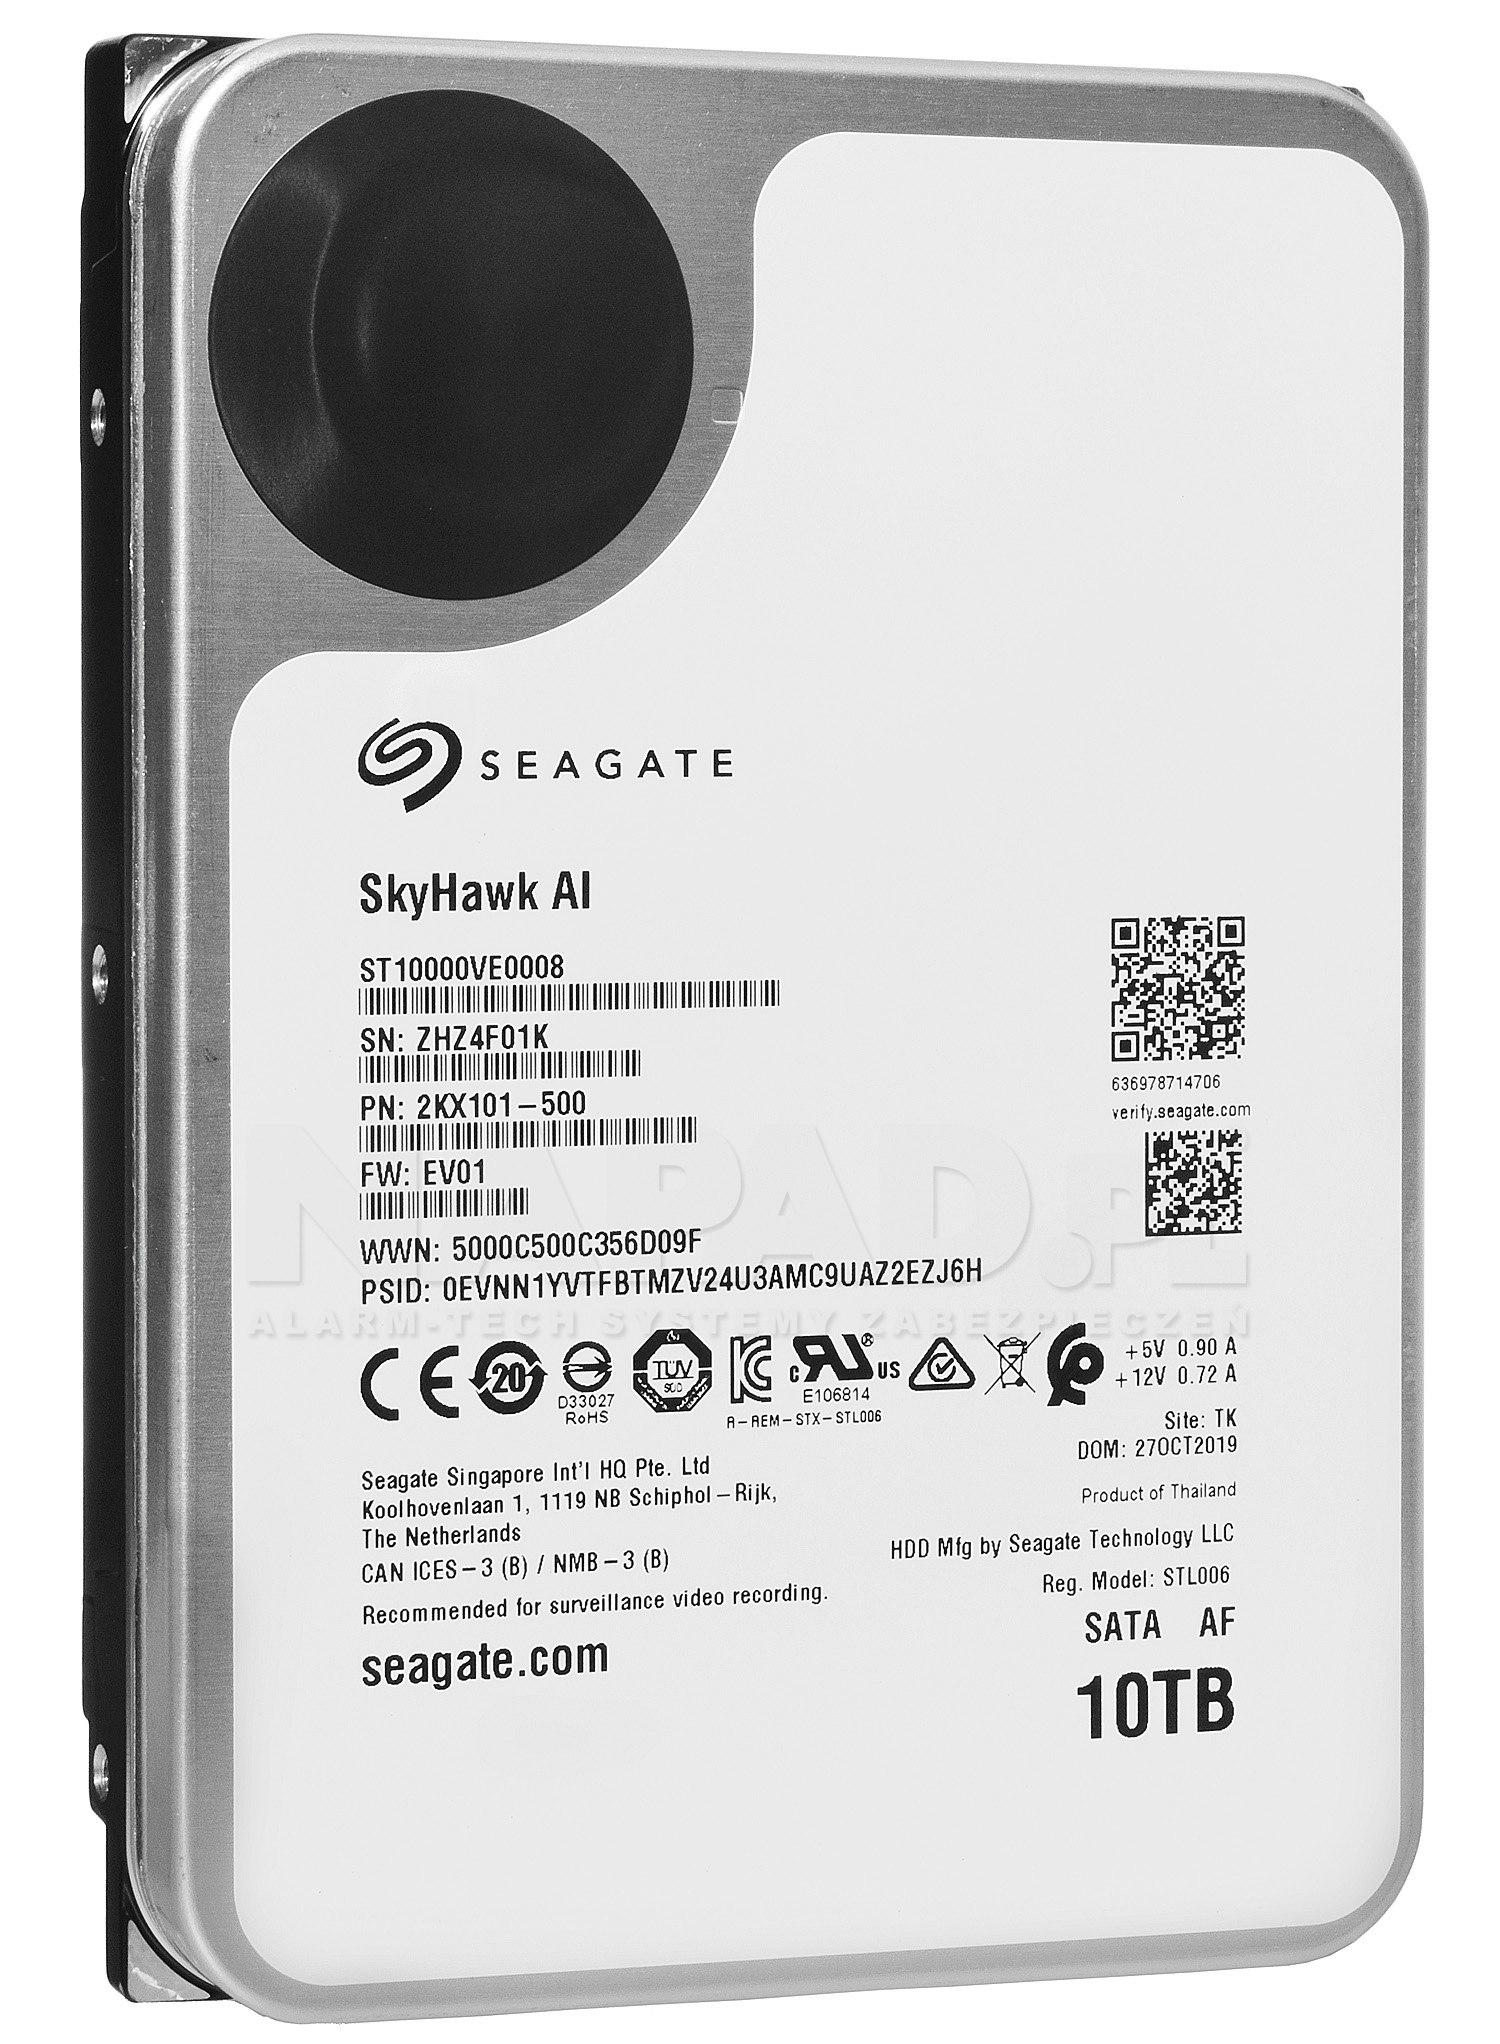 Dysk 10TB SATA III Seagate SkyHawk